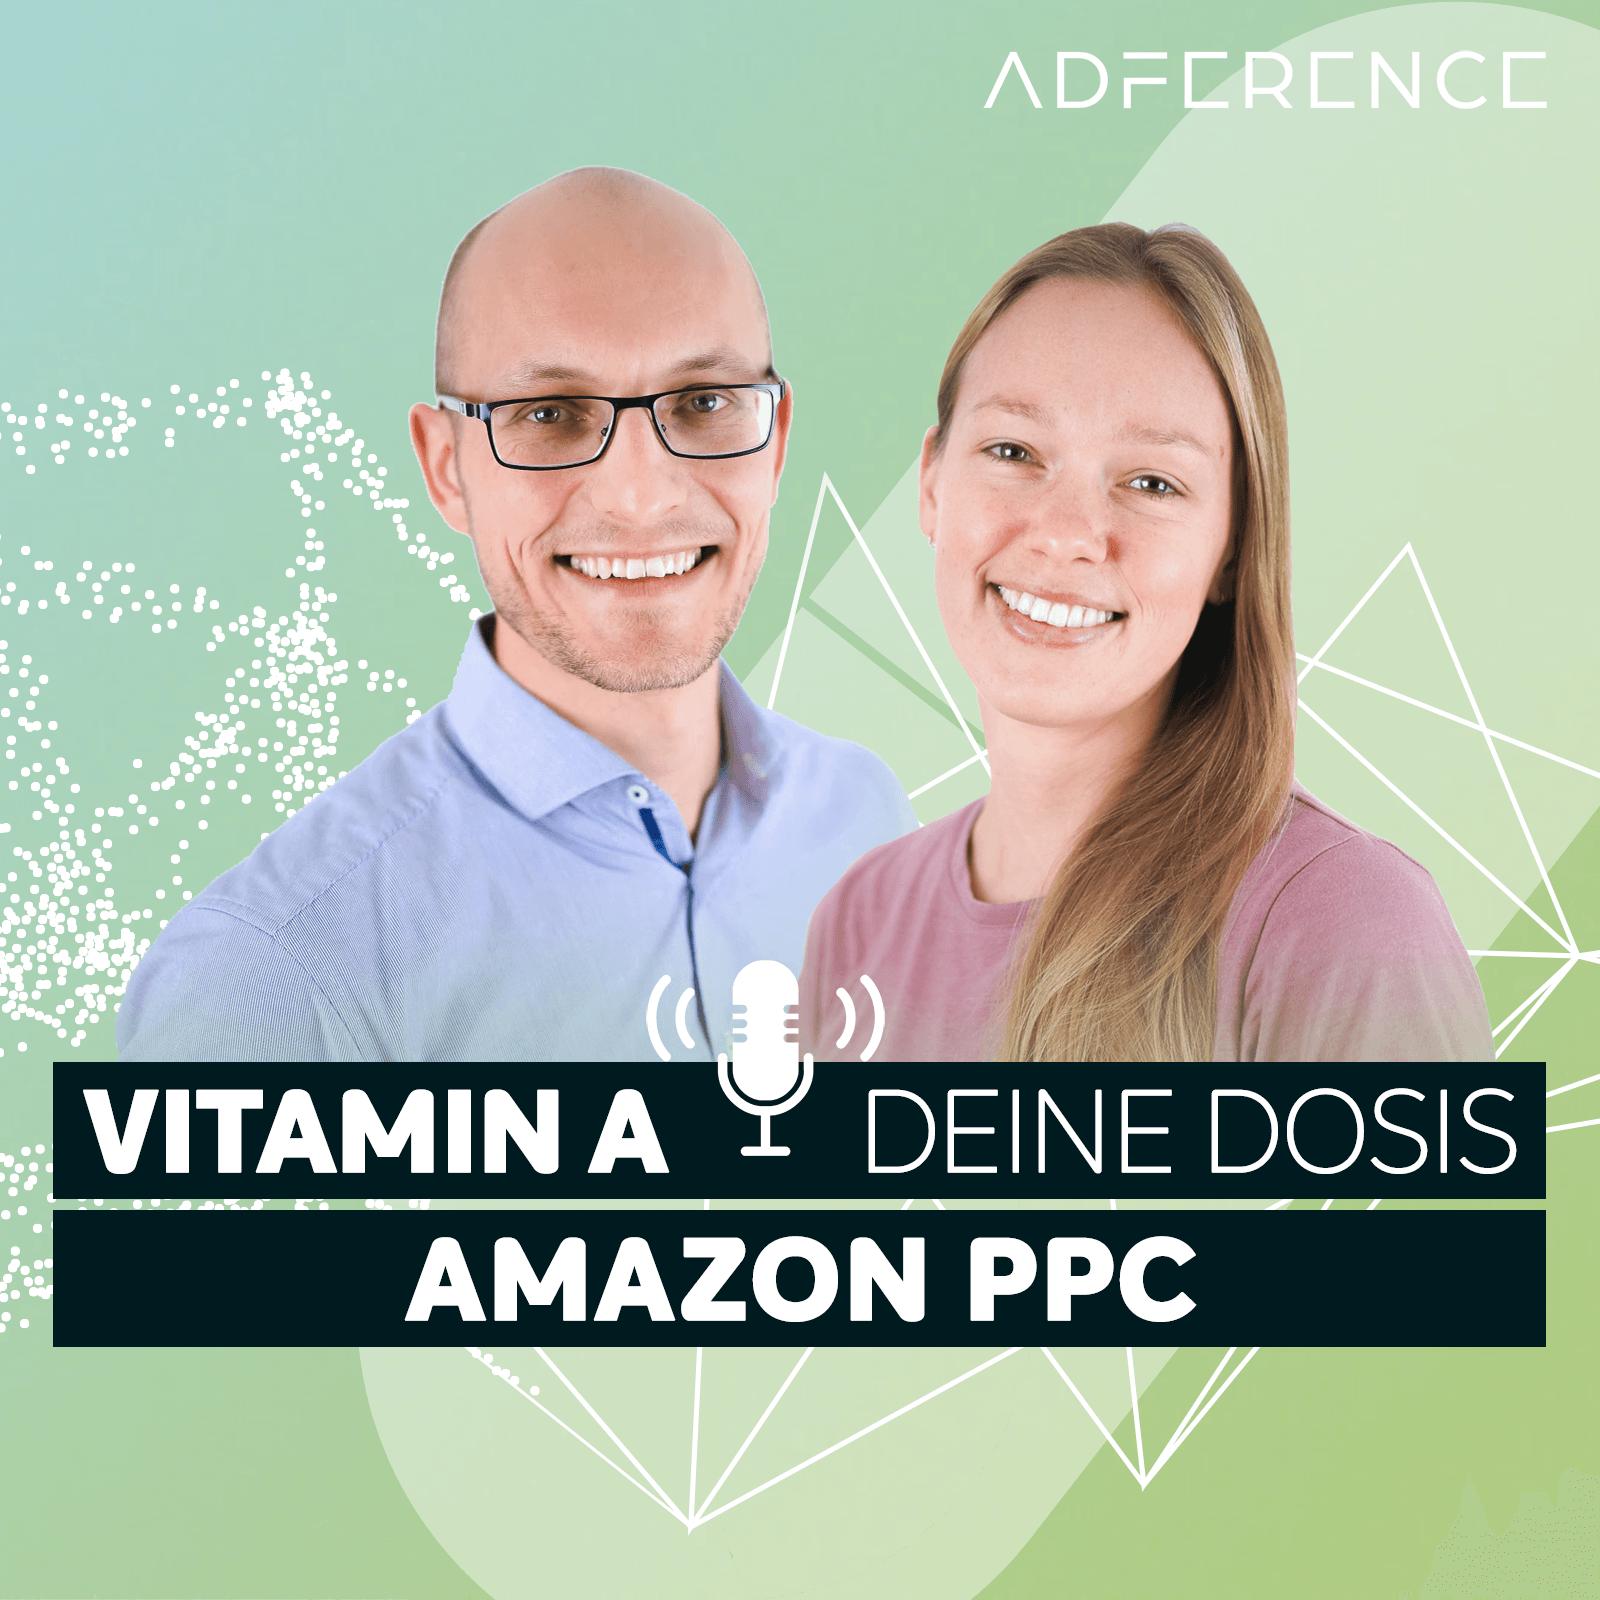 Vitamin A - Deine Dosis Amazon PPC